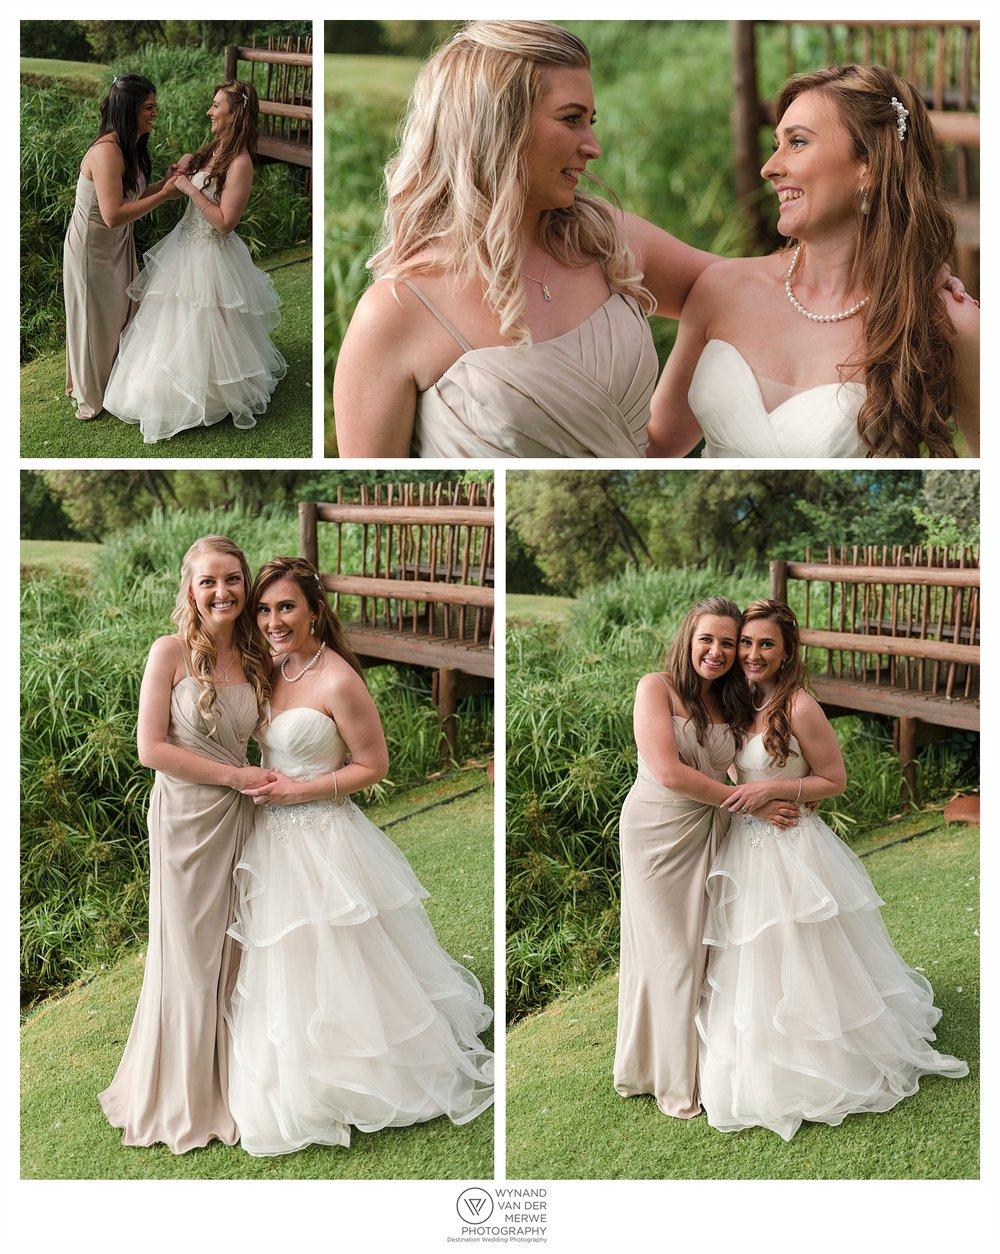 Wynandvandermerwe ryan natalia wedding photography cradle valley guesthouse gauteng-522.jpg